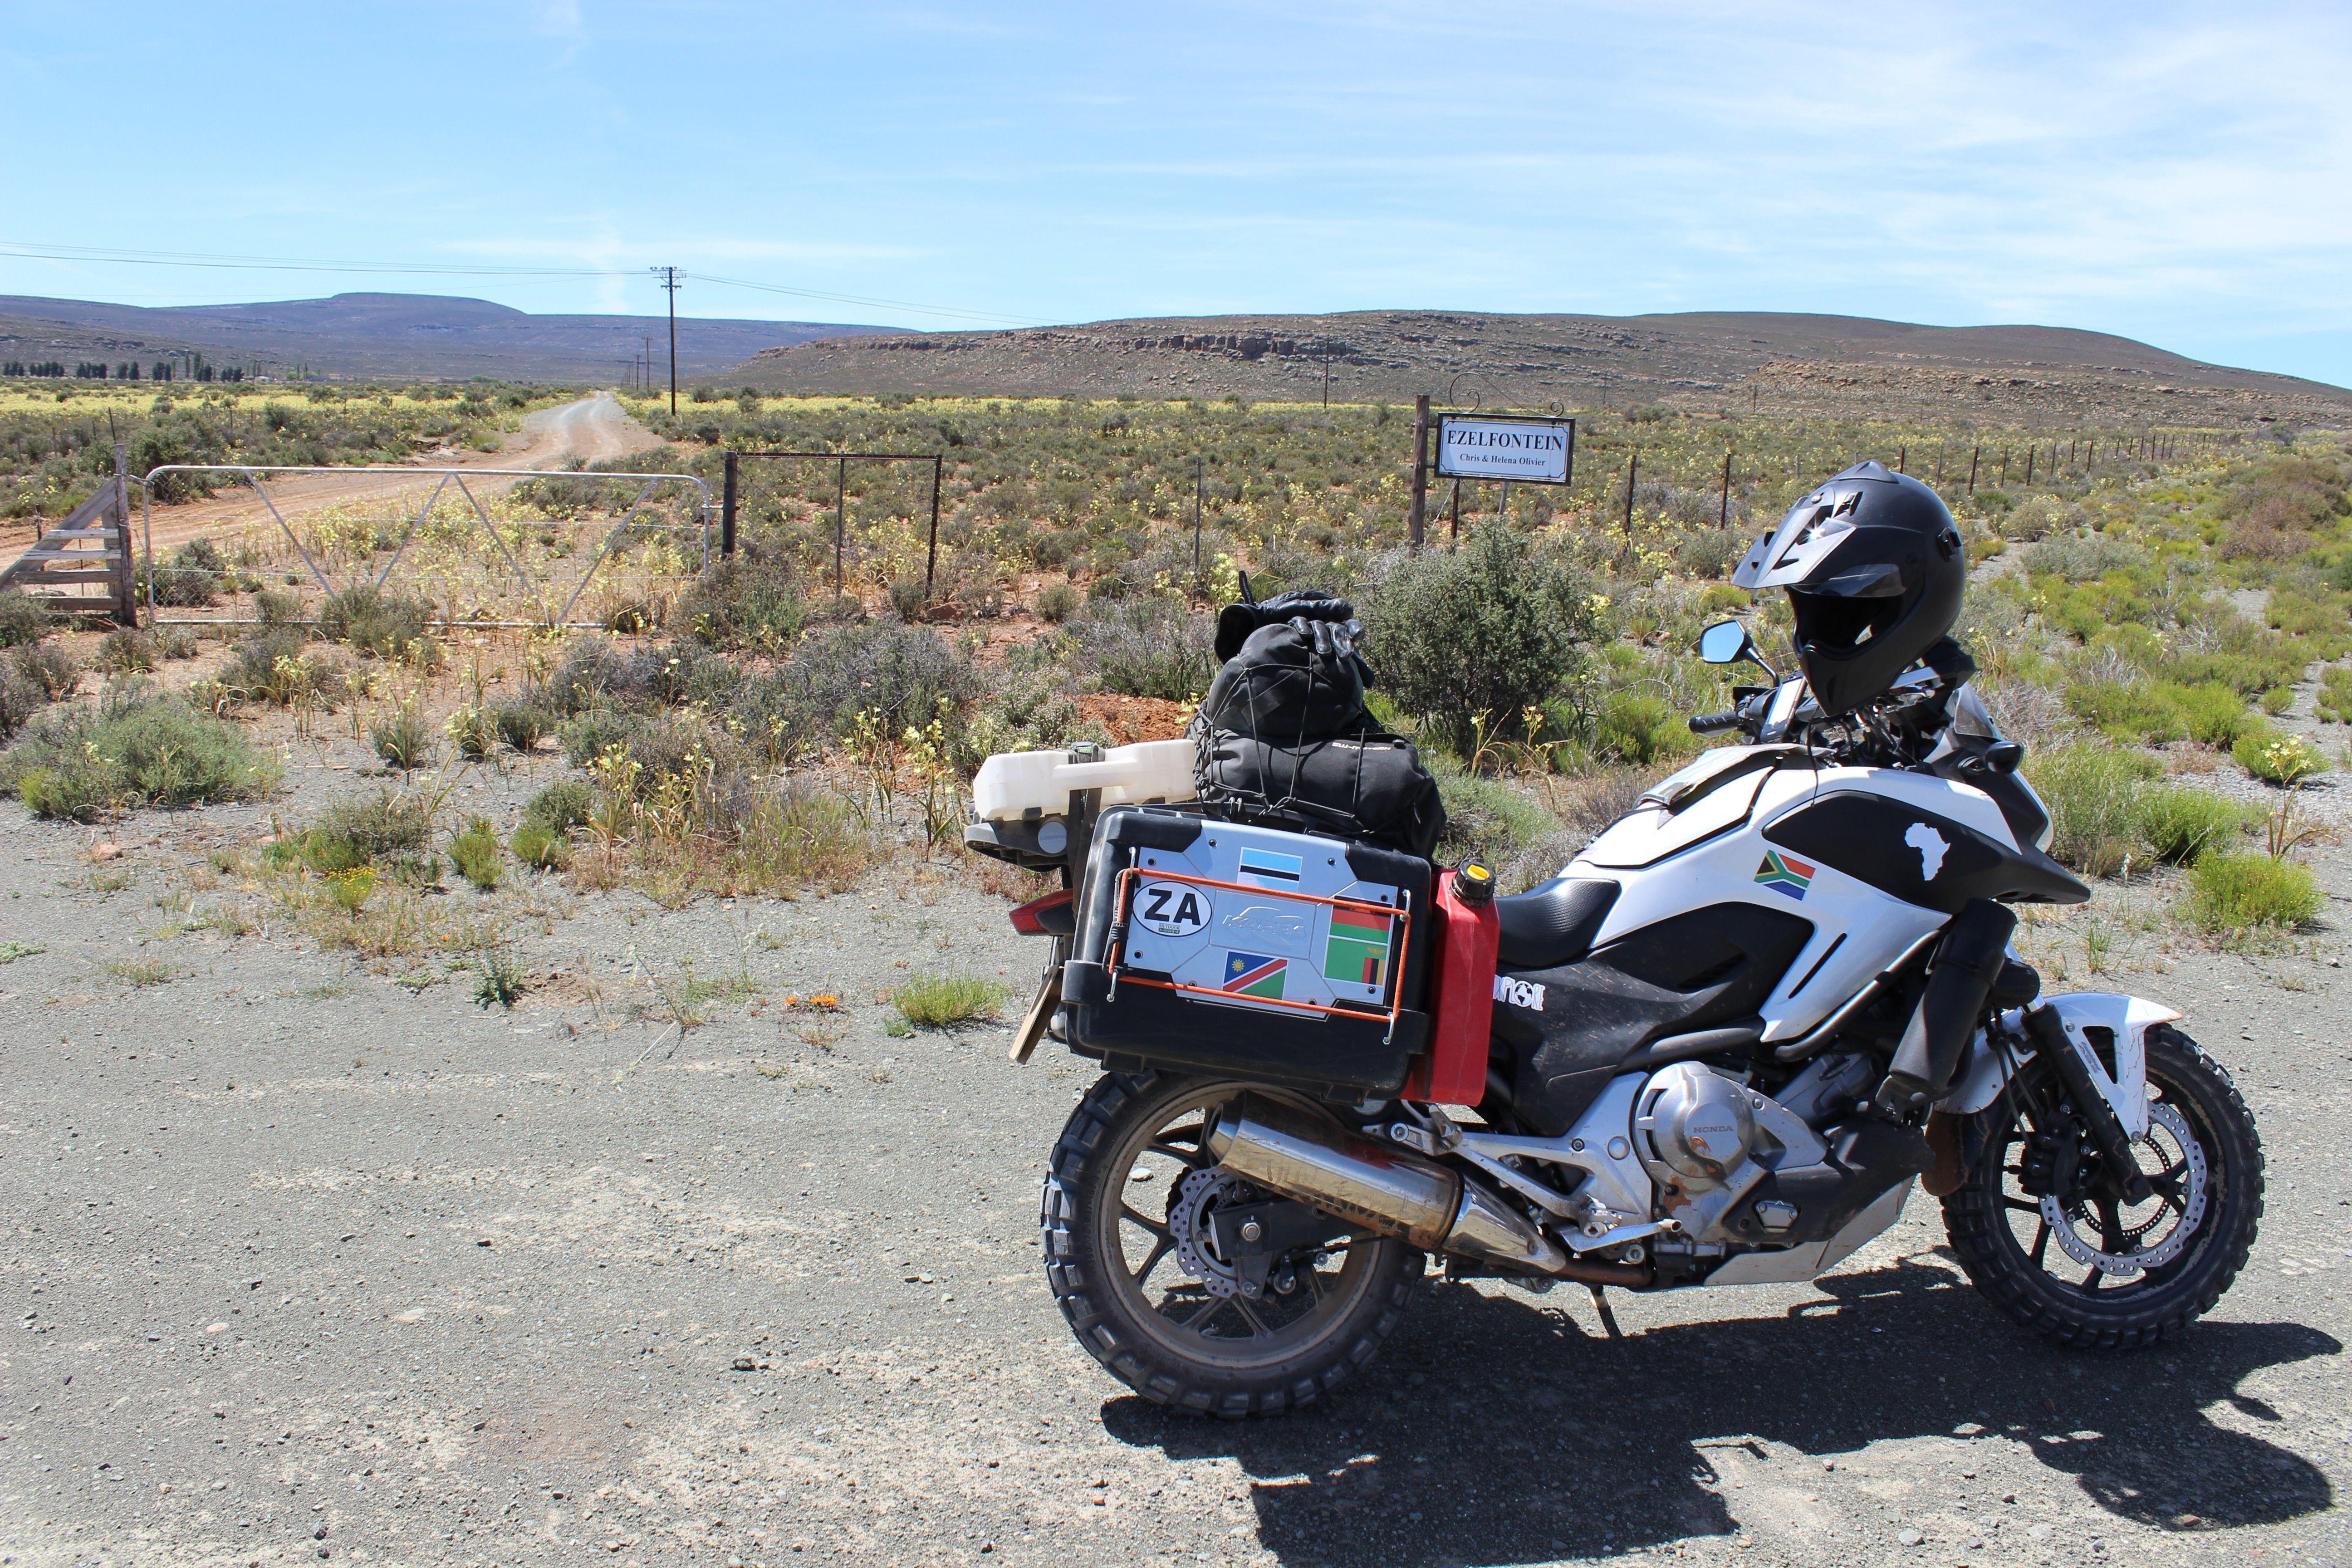 honda nc700x dct overland cape to kenya | honda nc700x dct